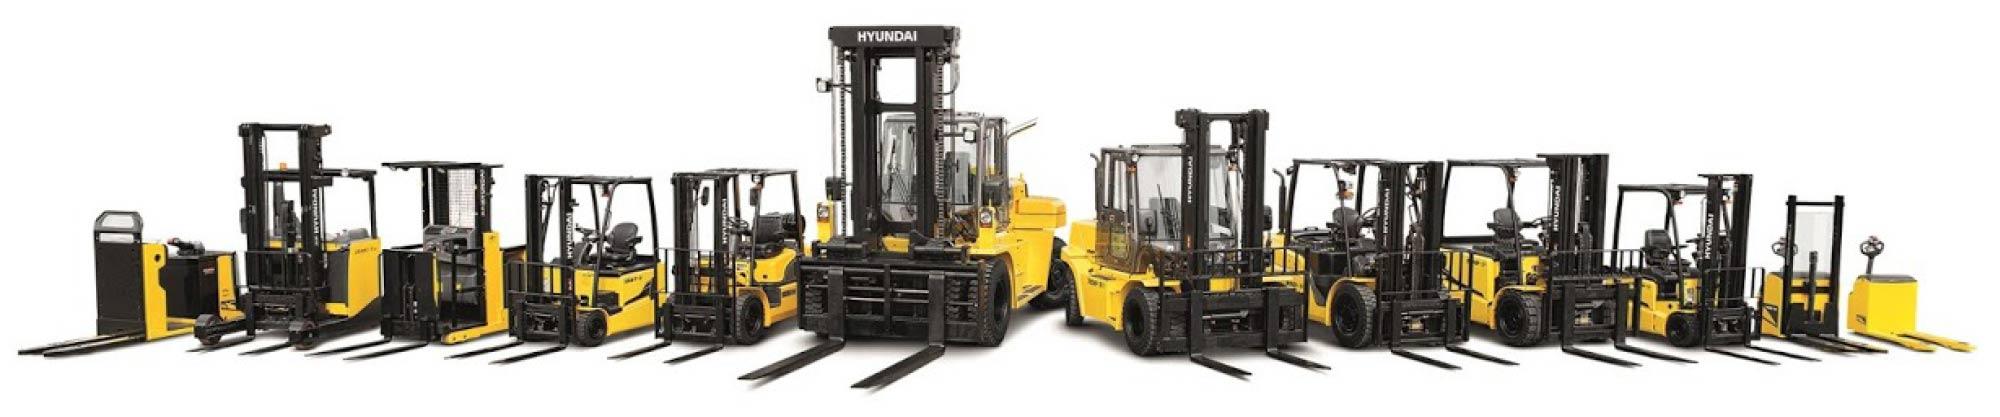 gama-completa-alquiler-renting-carretillas-equipos-hyundai